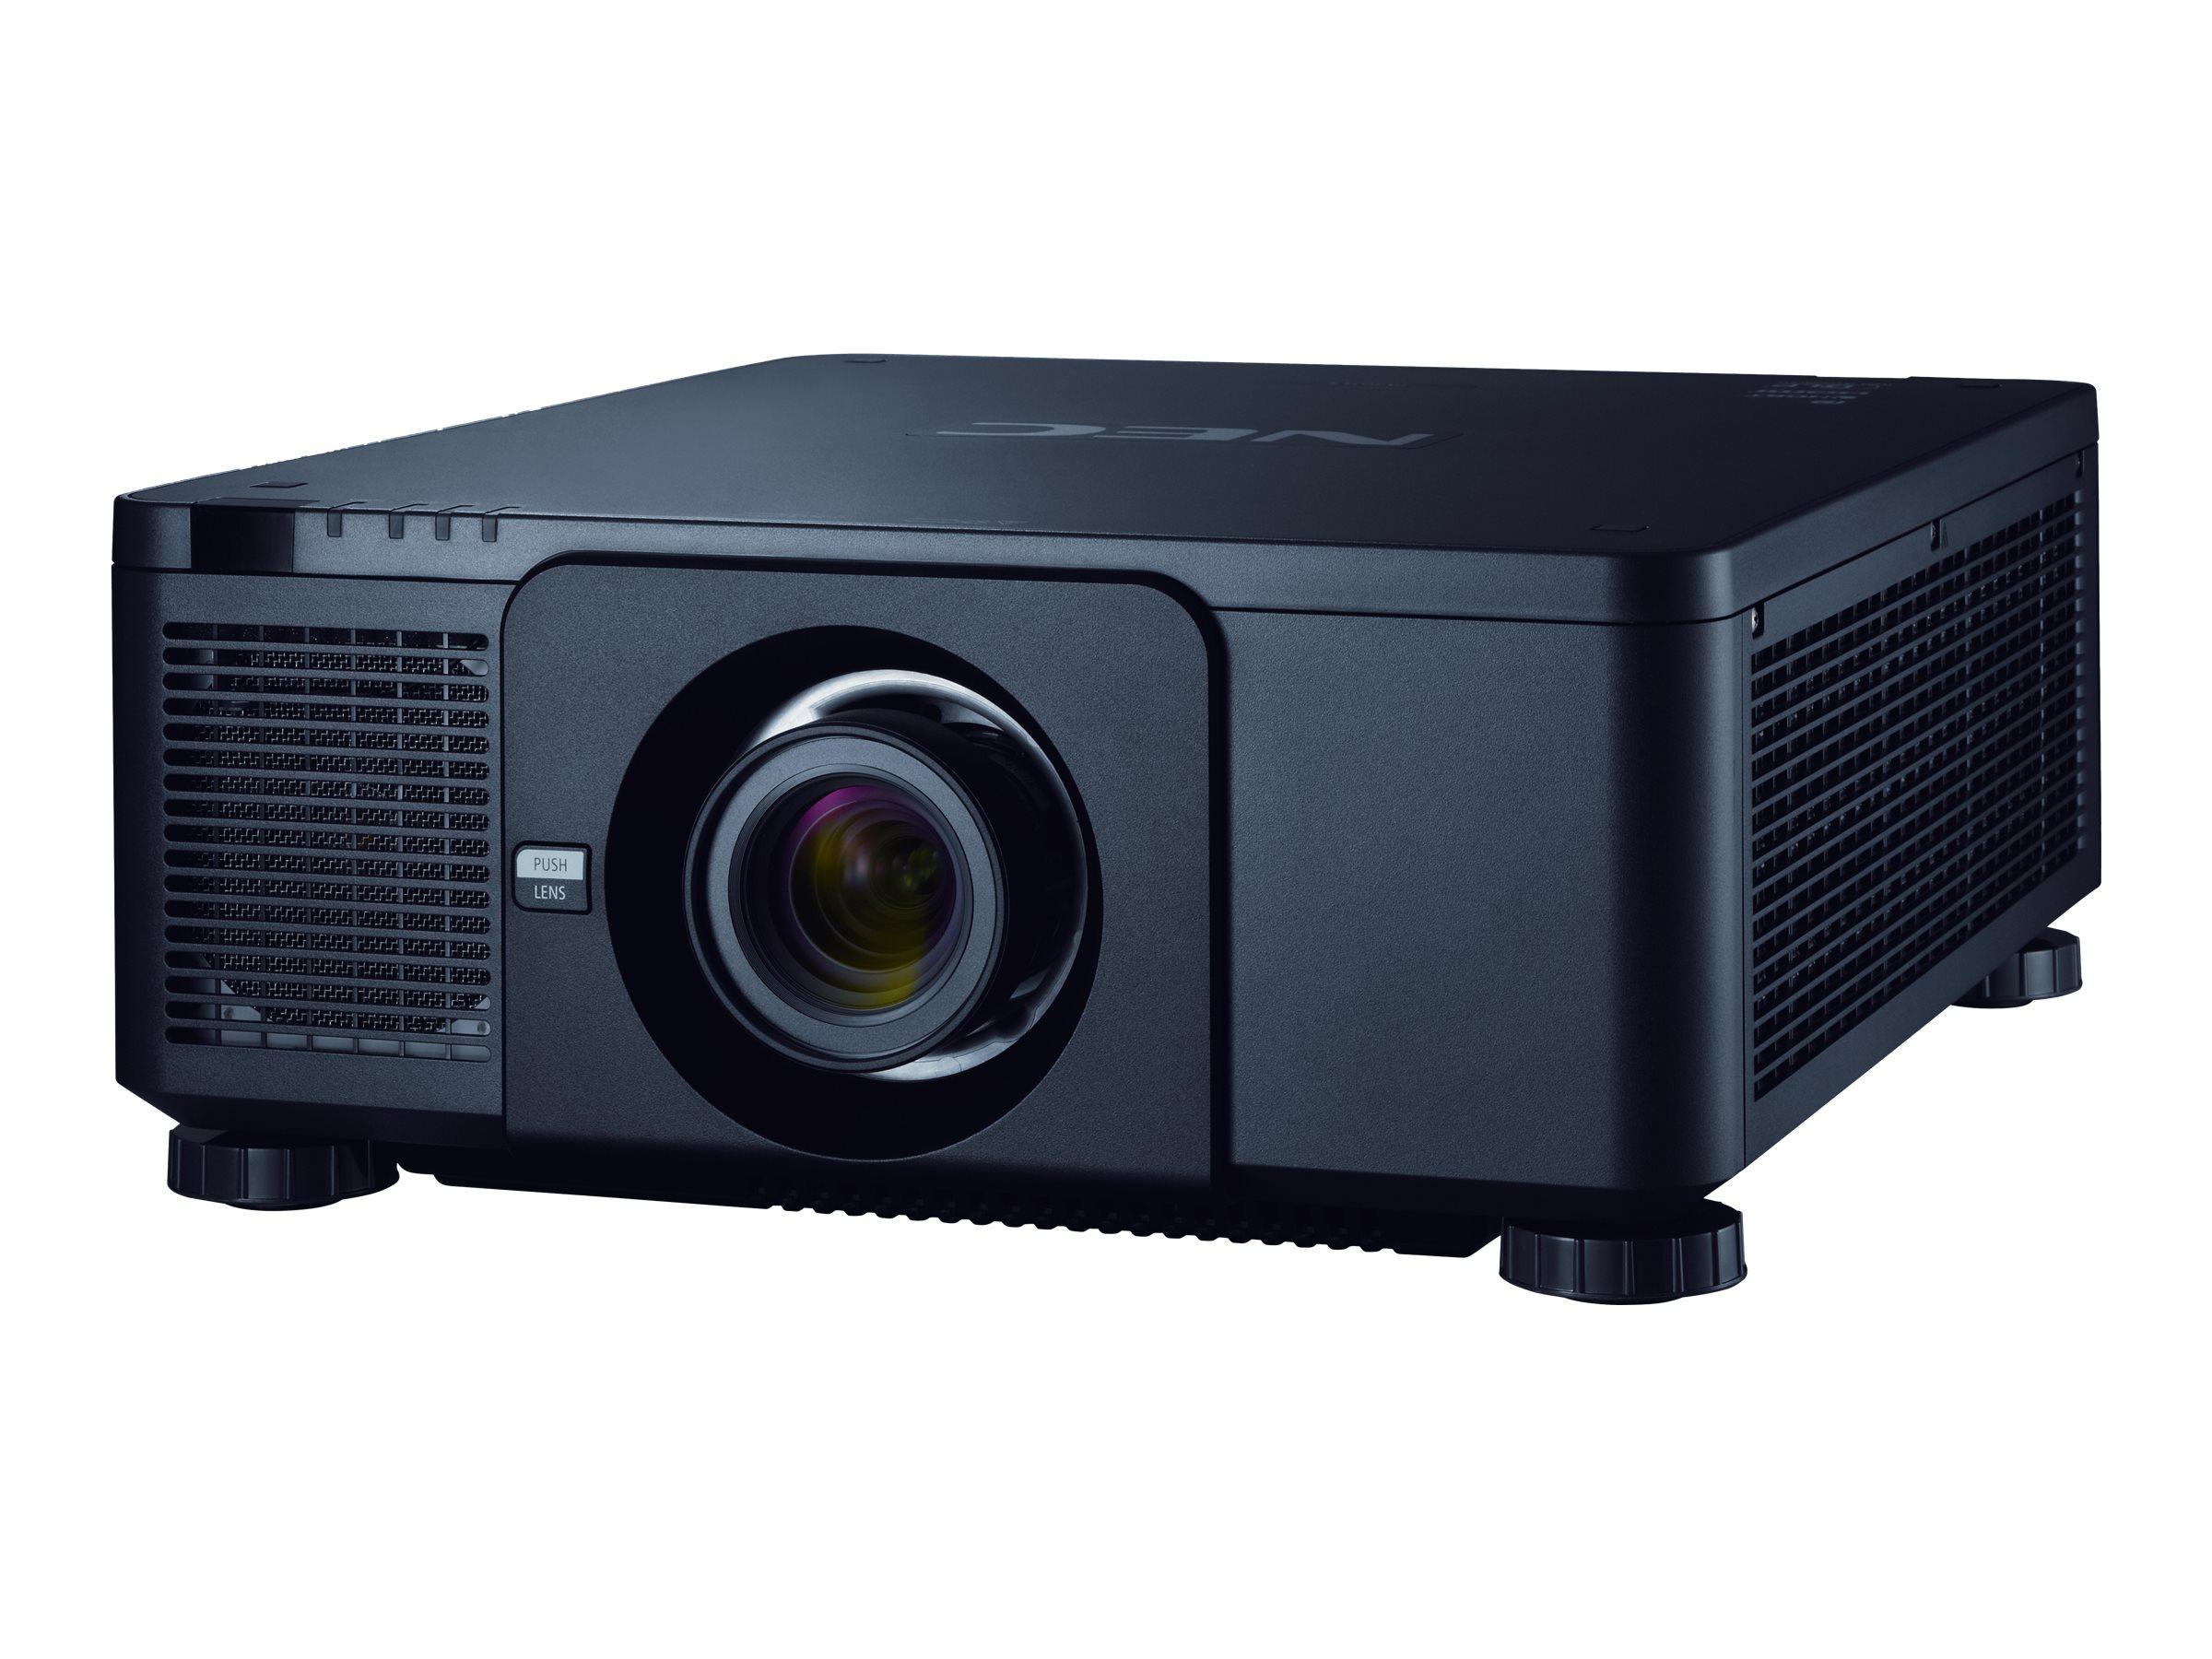 NEC NP-PX1004UL-BK WUXGA DLP Projector, 10000 Lumens, Black